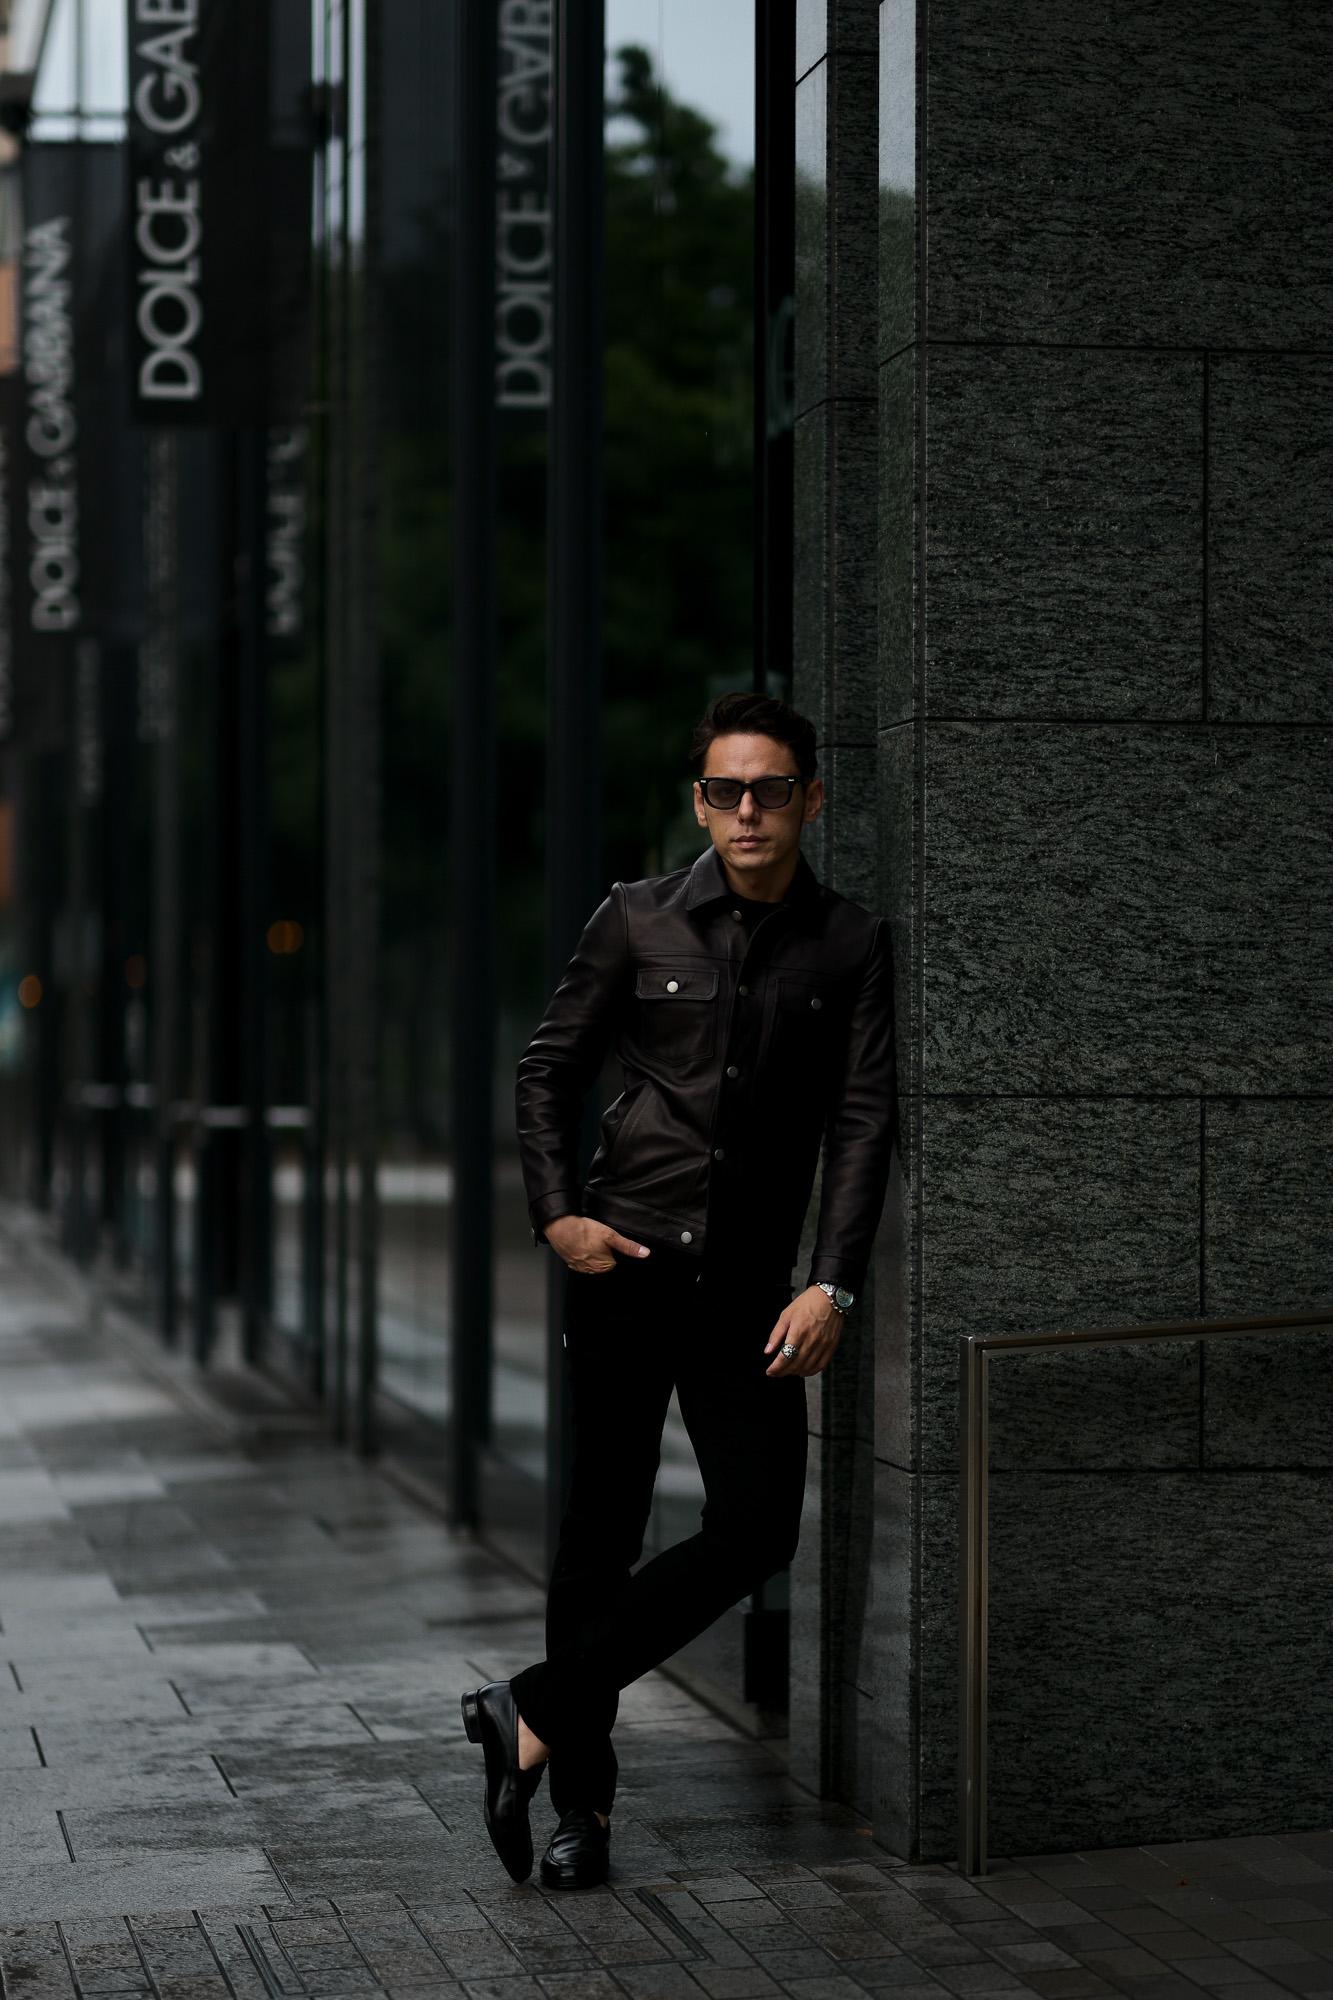 MOLEC (モレック) 3rd type Leather Jacket (3rdタイプ レザー ジャケット) PLONGE Lambskin プロンジェラムレザー サードタイプ レザー トラッカージャケット NERO (ブラック) Made in italy (イタリア製) 2021 【ご予約開始】愛知 名古屋 Alto e Diritto altoediritto アルトエデリット